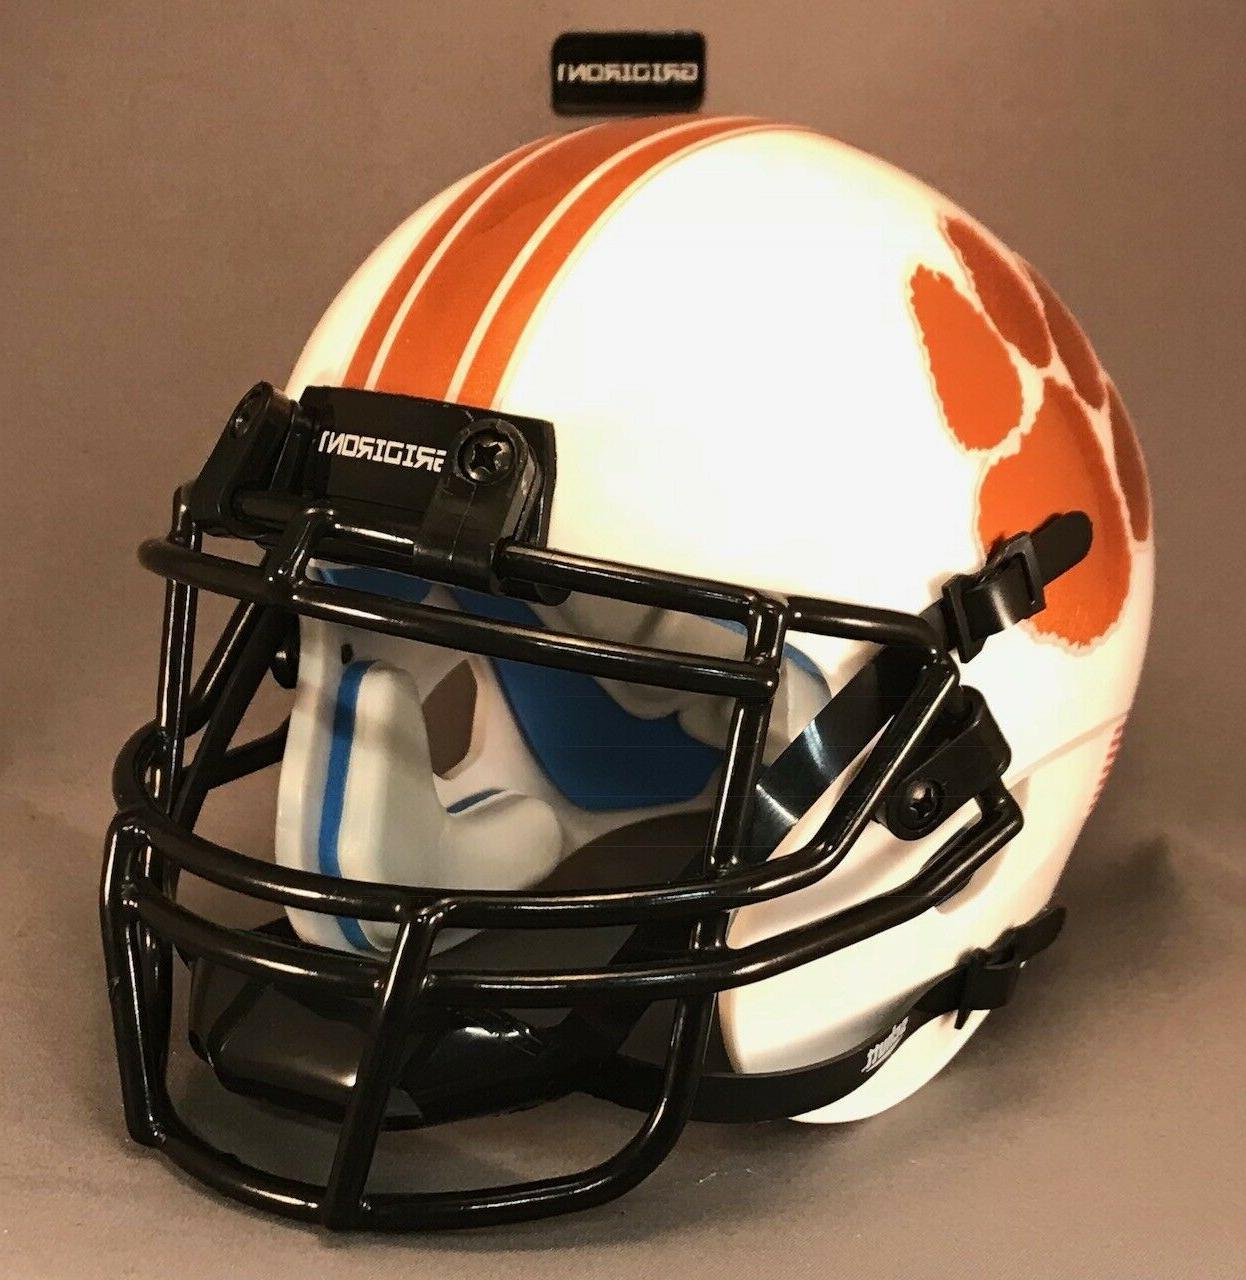 Mini football helmet Facemask with Screws